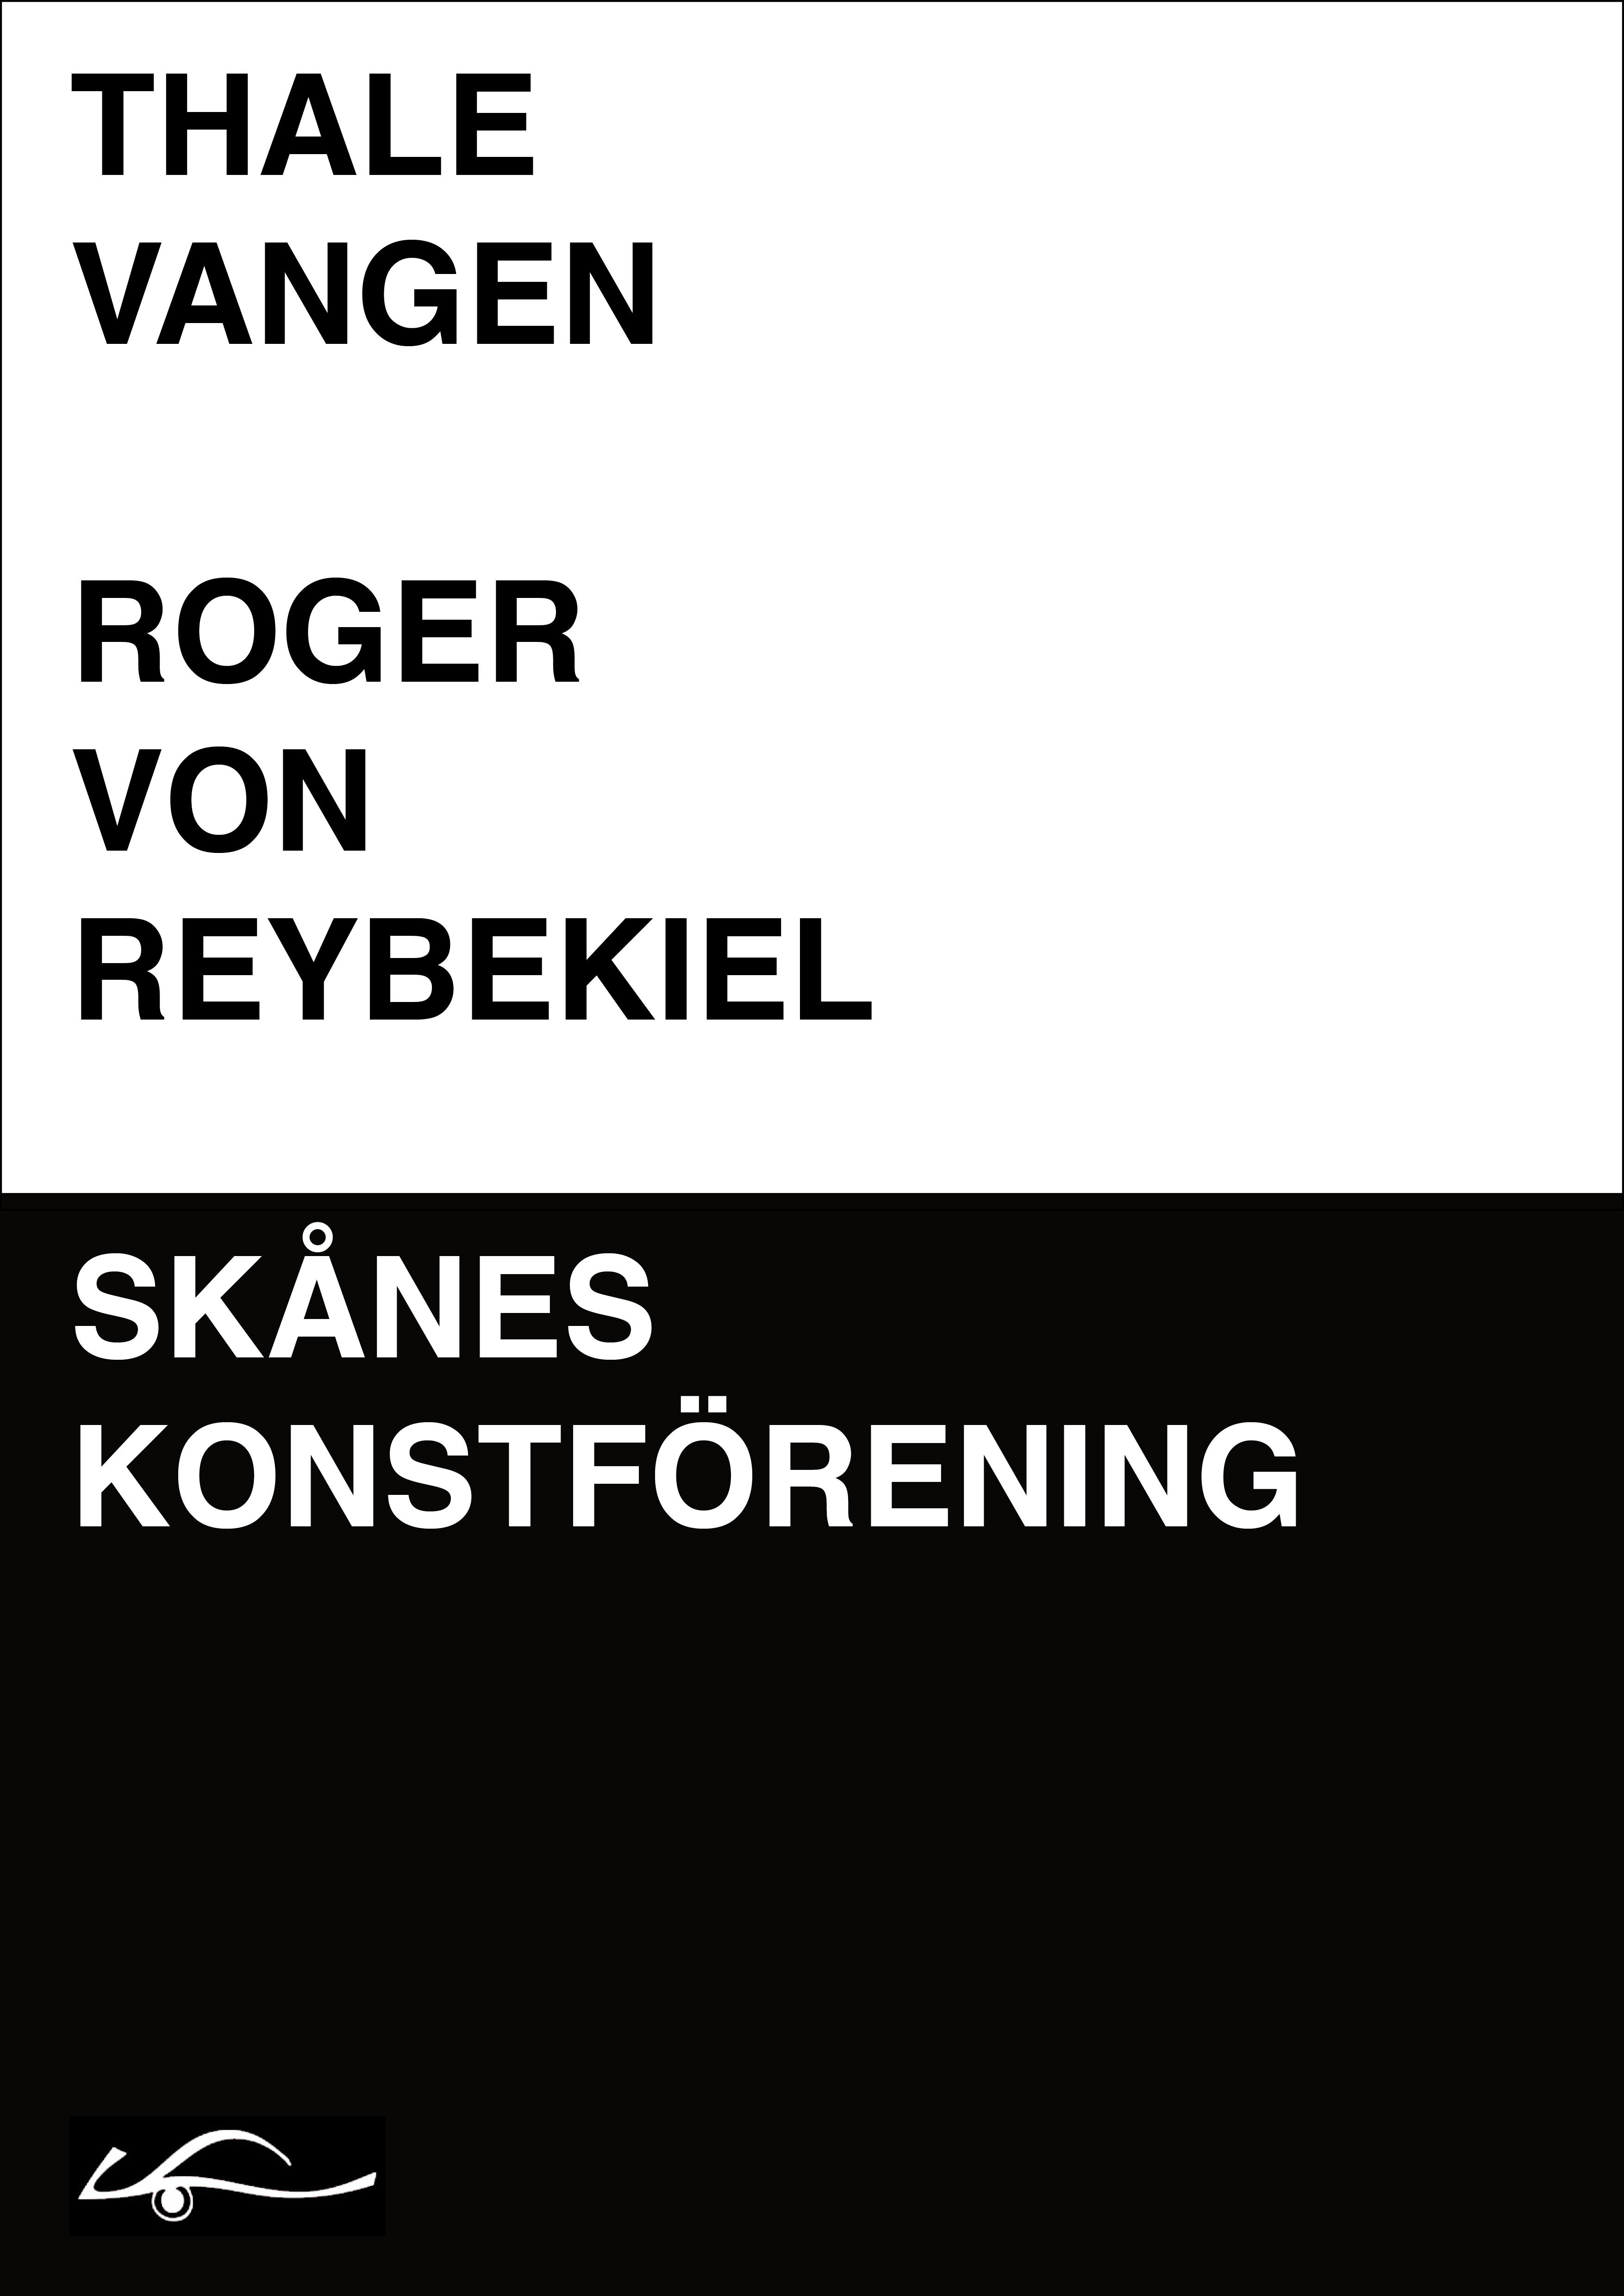 ska%cc%8anes-konstfo%cc%88rening-poster-001